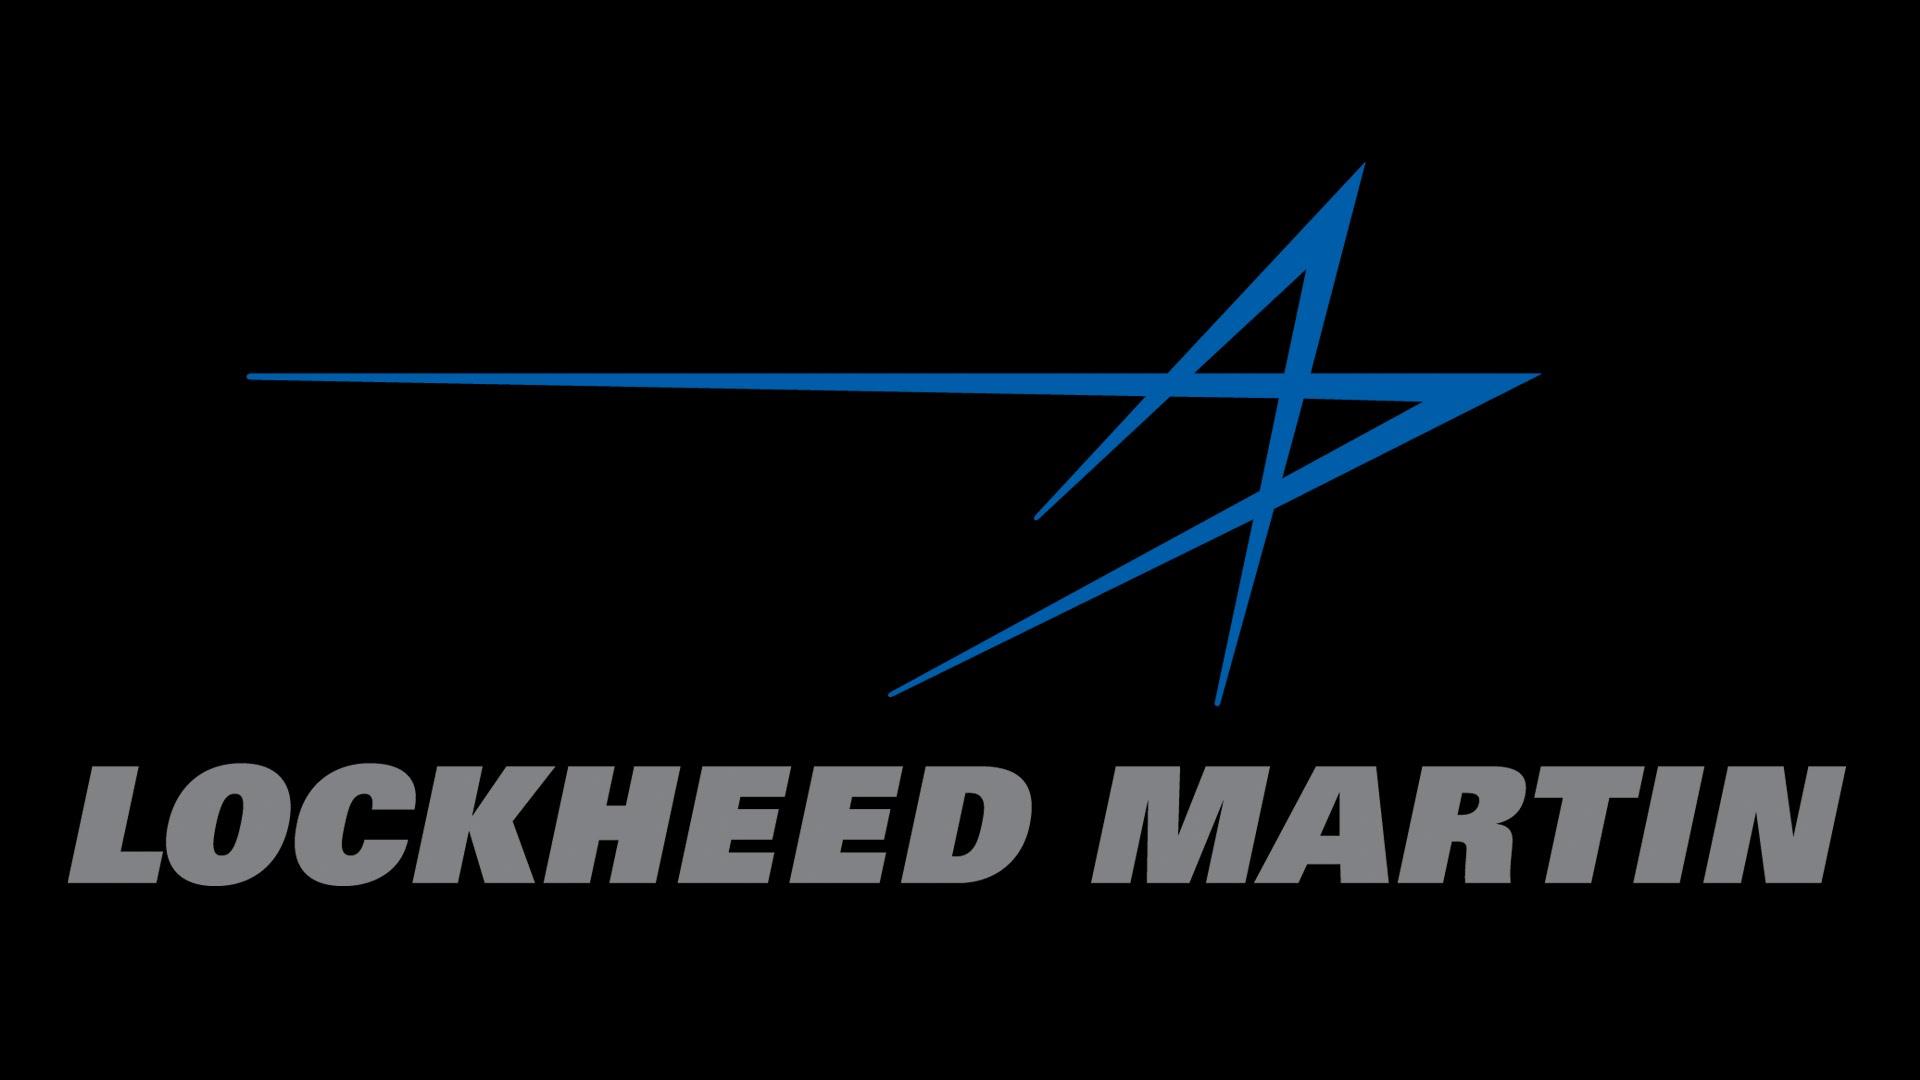 lockheed martin stock dividend